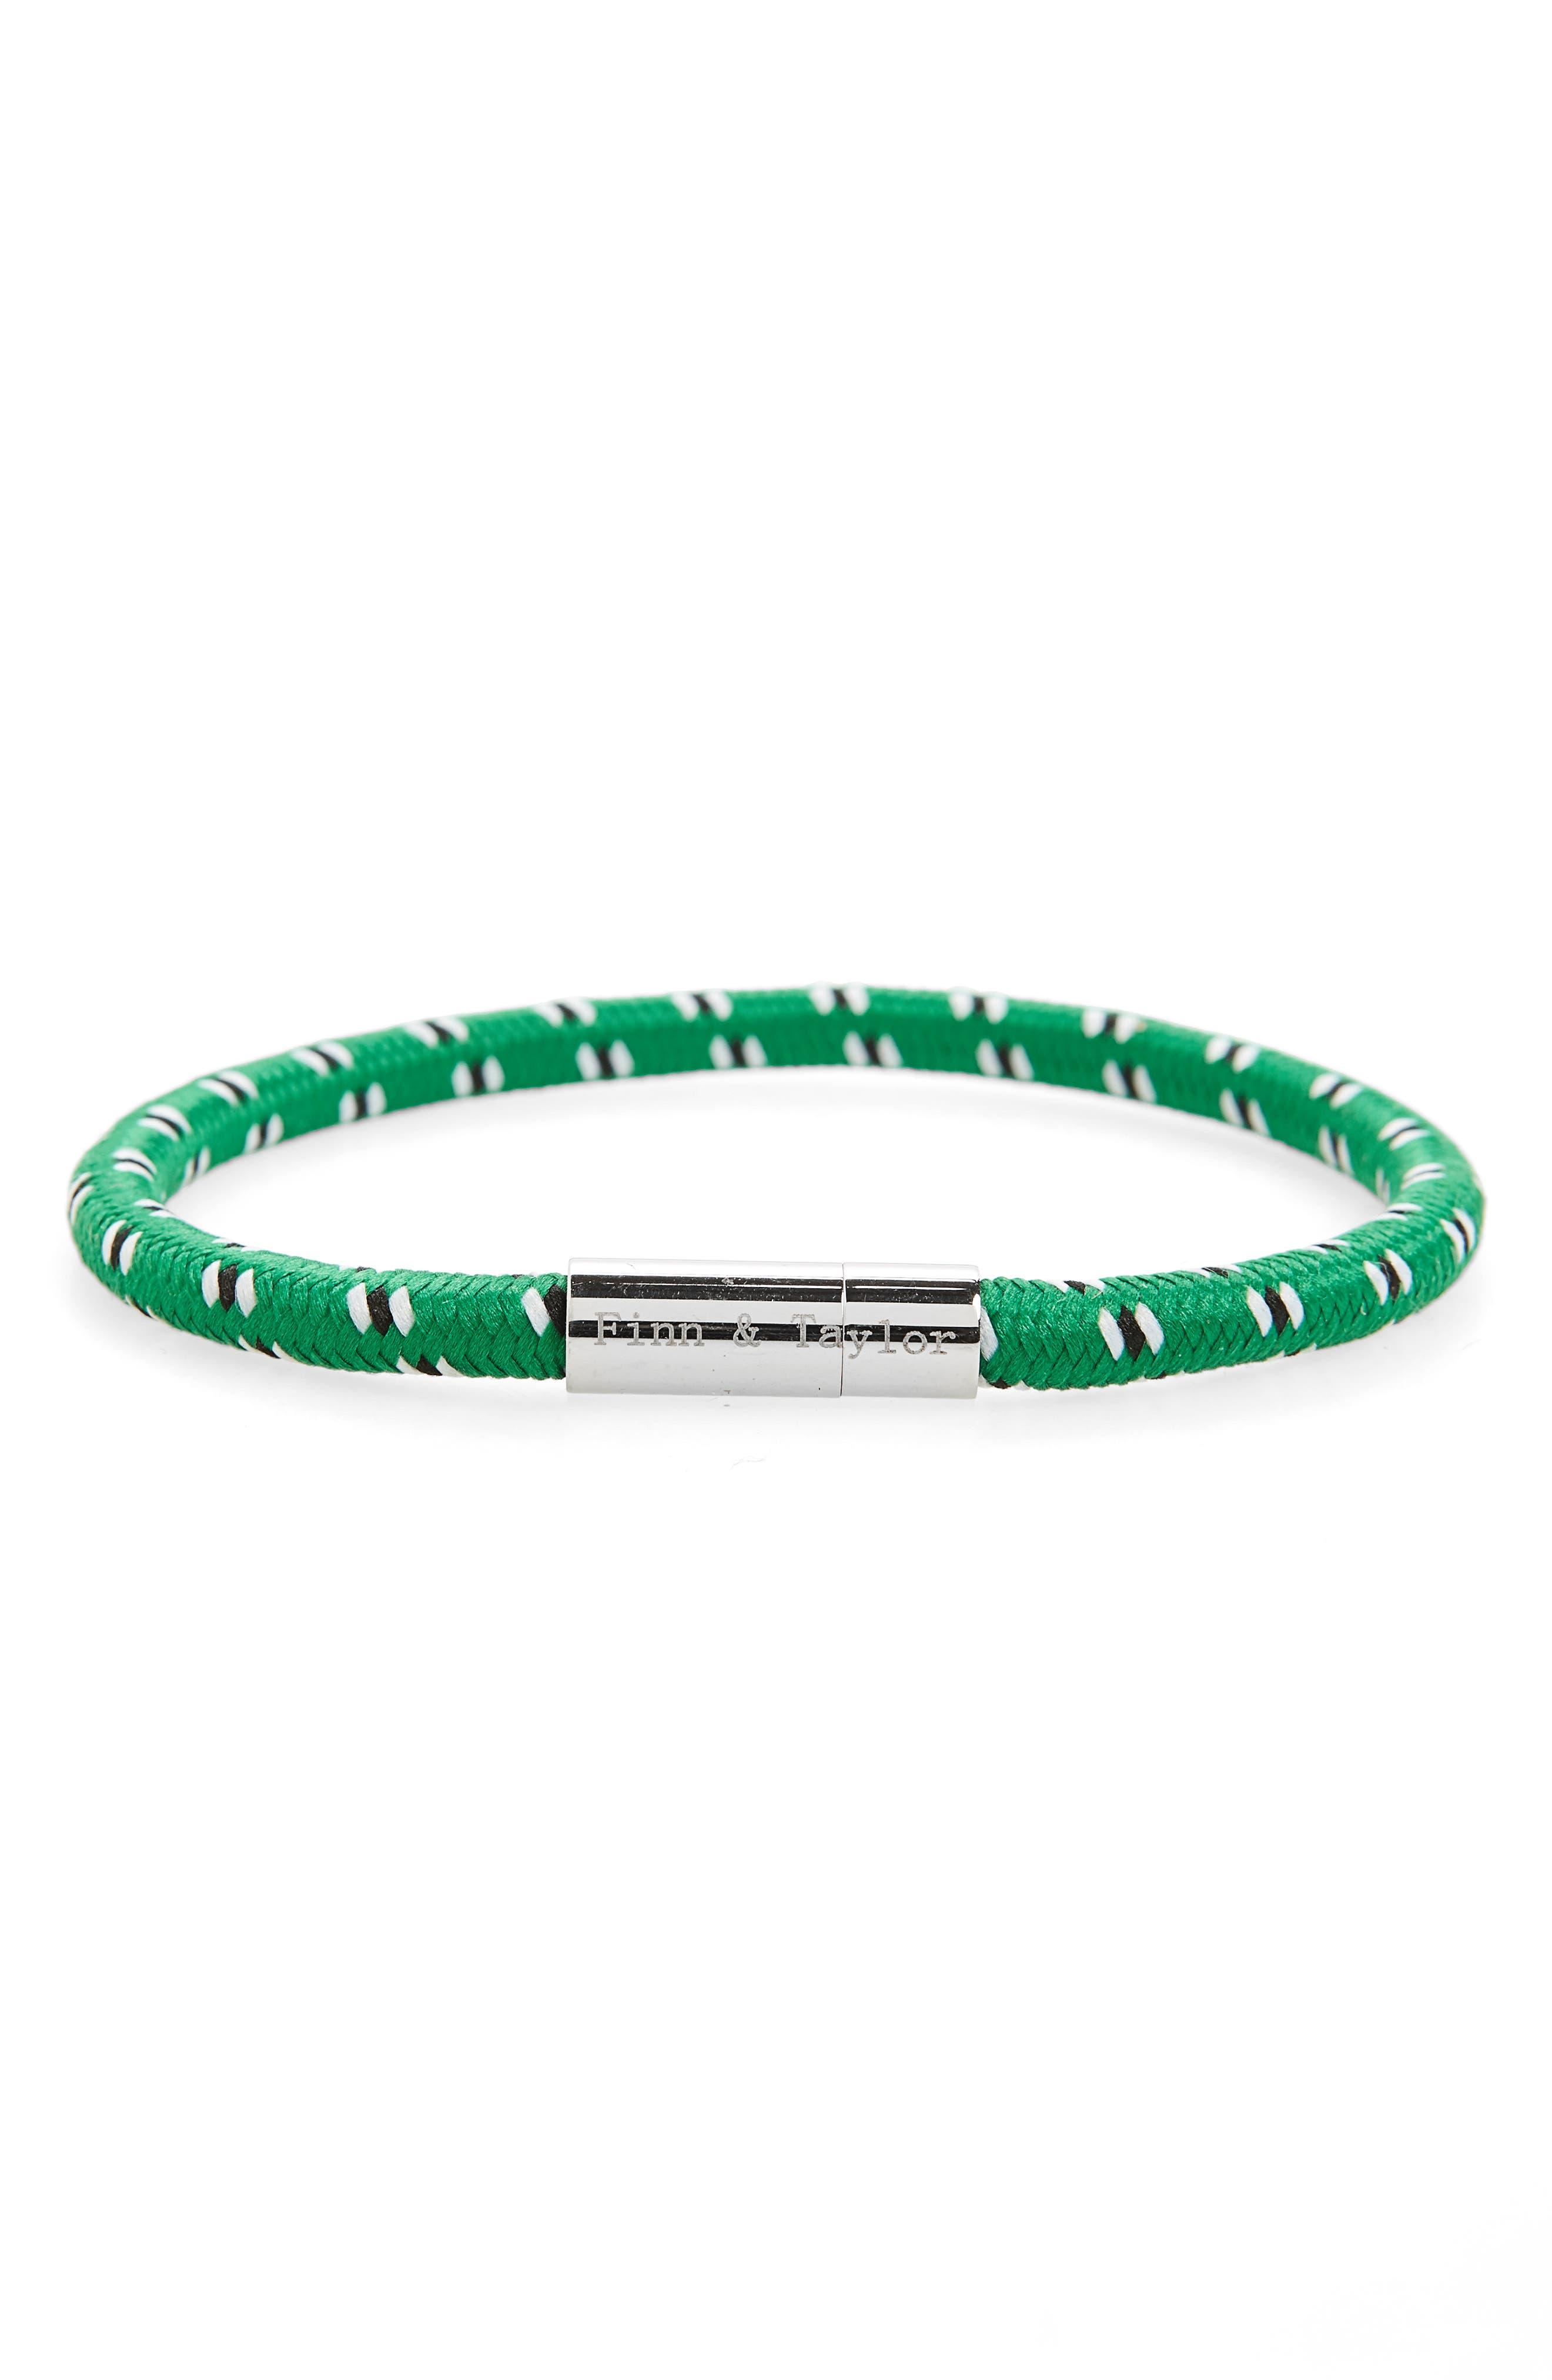 Finn & Taylor Elastic Bracelet,                         Main,                         color, Green